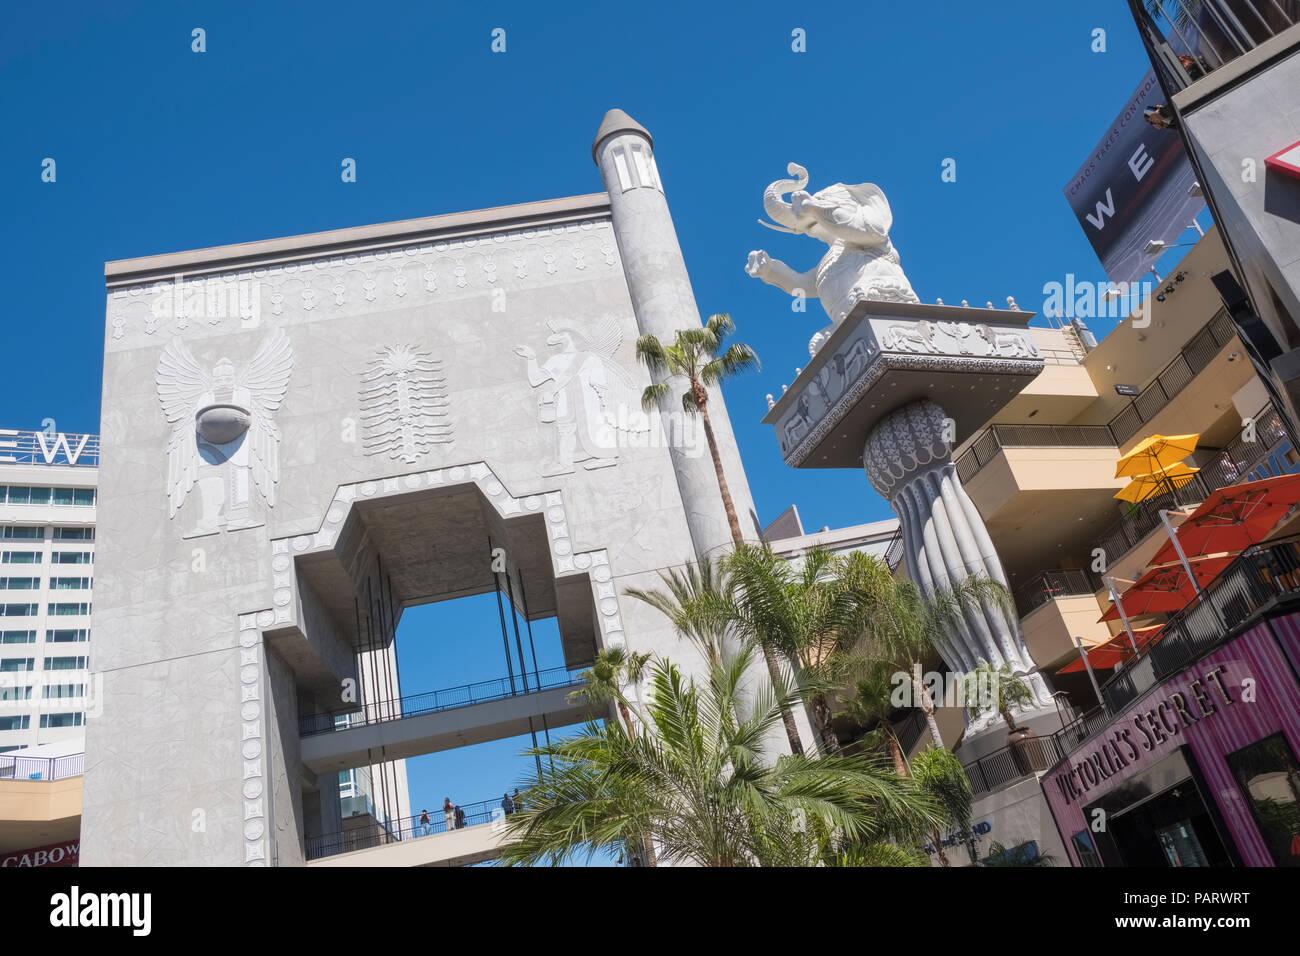 A tema egiziano edifici e architettura all'Hollywood & Highland centro retail, Hollywood Boulevard, Los Angeles, la California, Stati Uniti d'America Immagini Stock